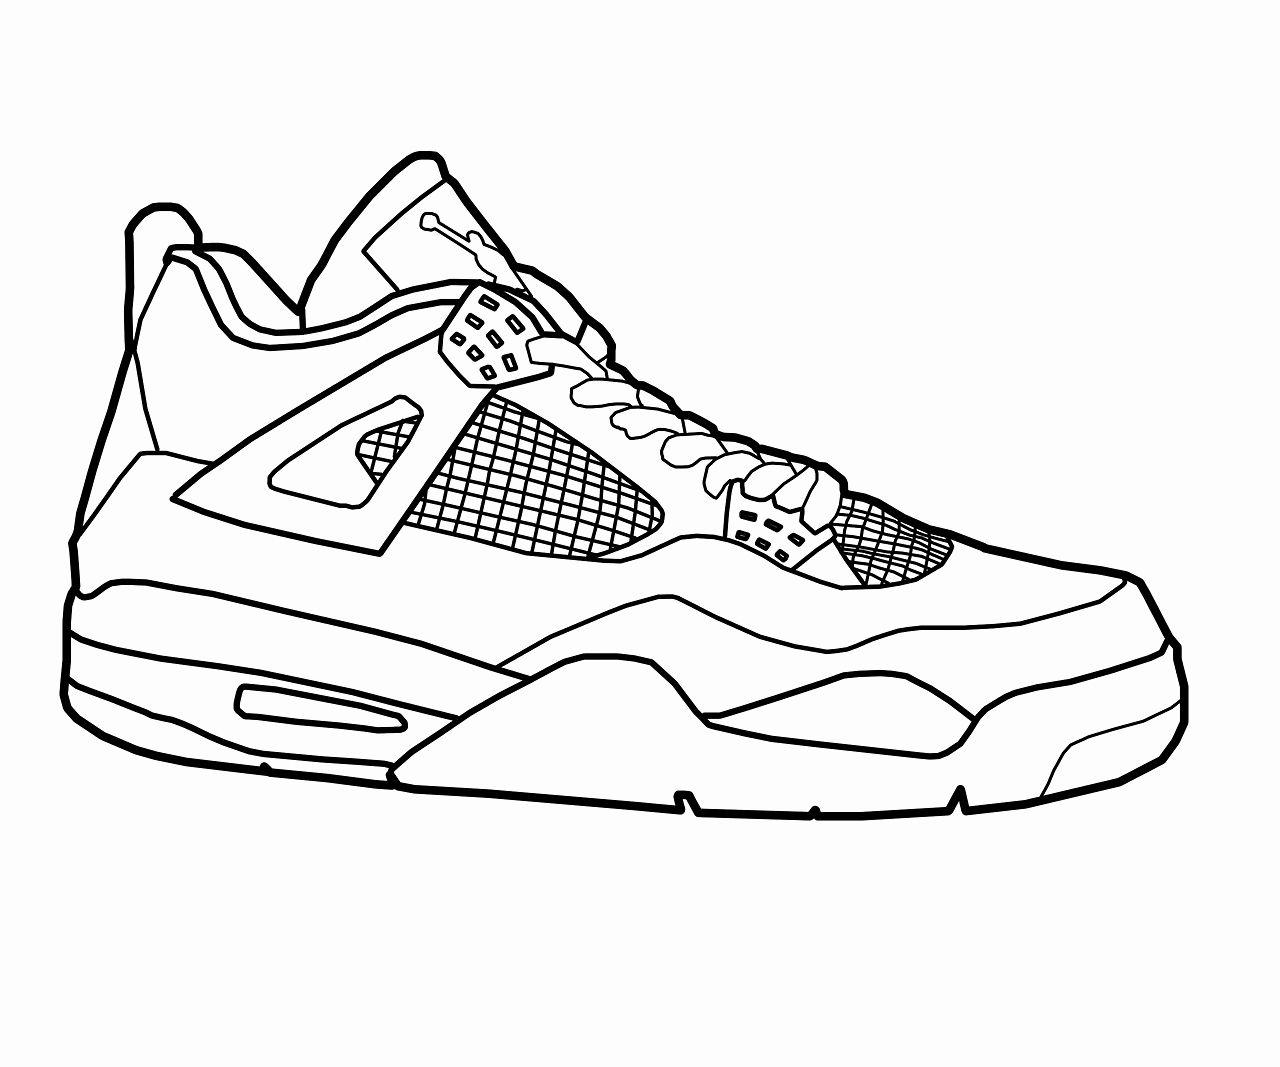 Jordan Shoe Coloring Book New Jordan Shoes Coloring Pages Coloring Home Sneakers Drawing Pictures Of Jordans Air Jordans